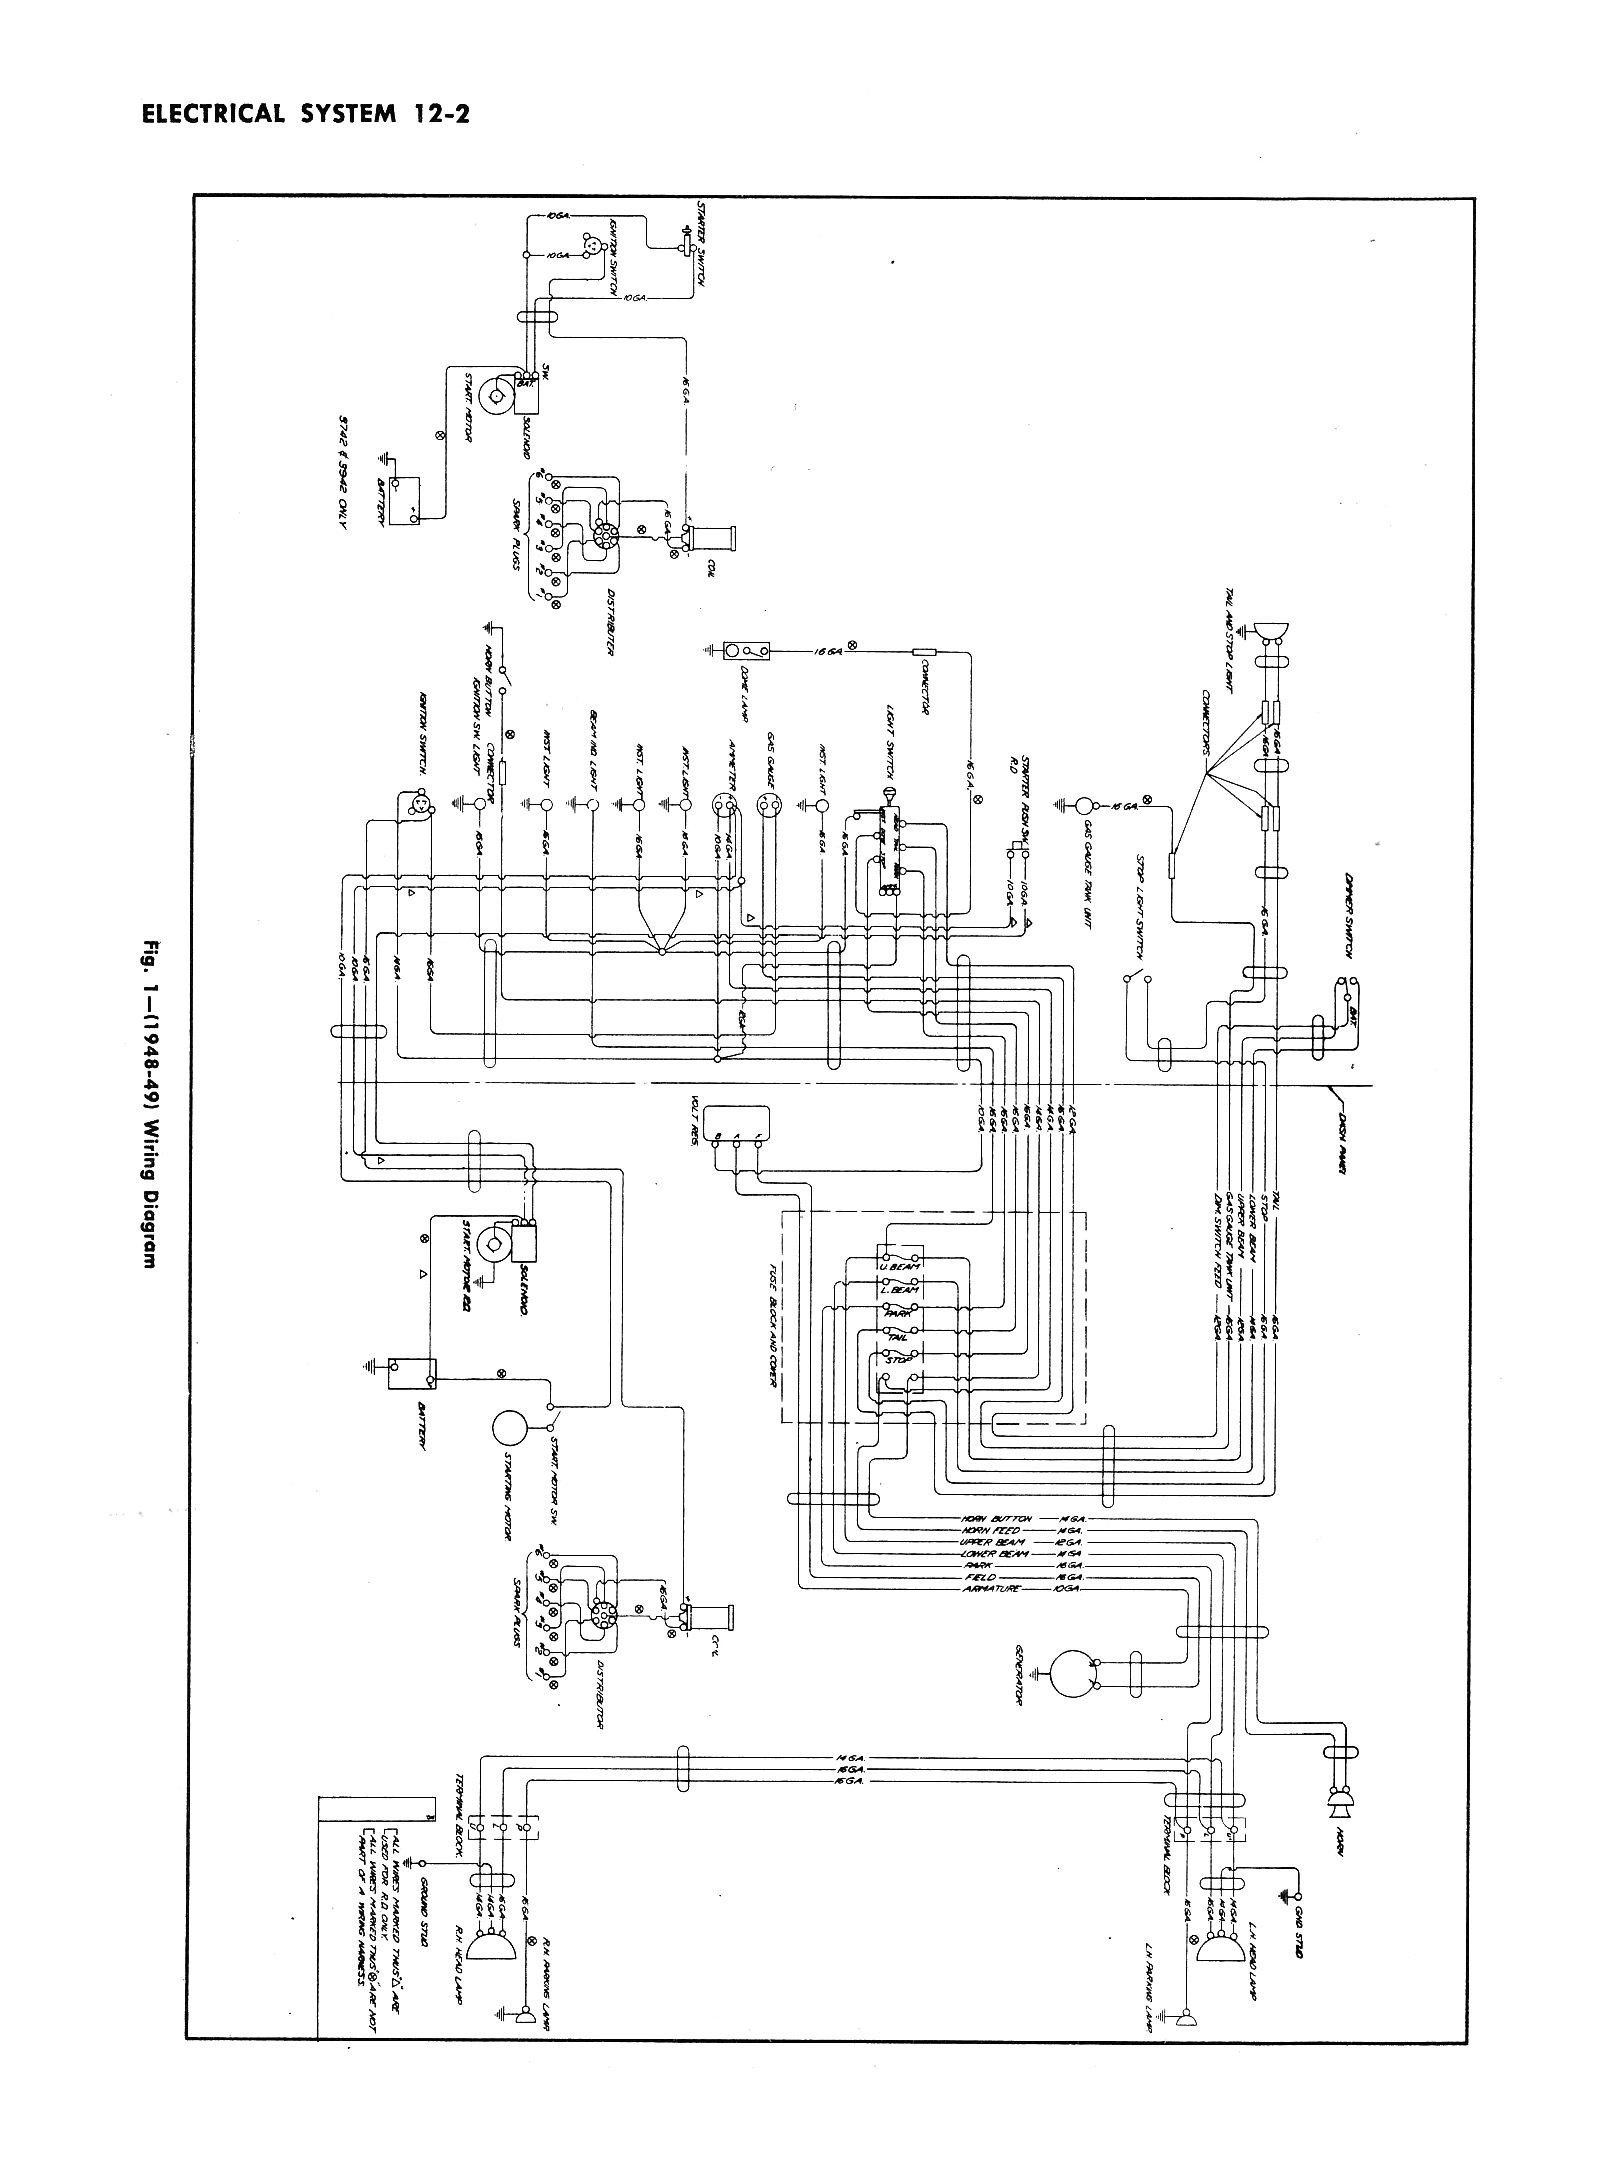 Wiring Manual PDF: 1929 Model A Wiring Diagram